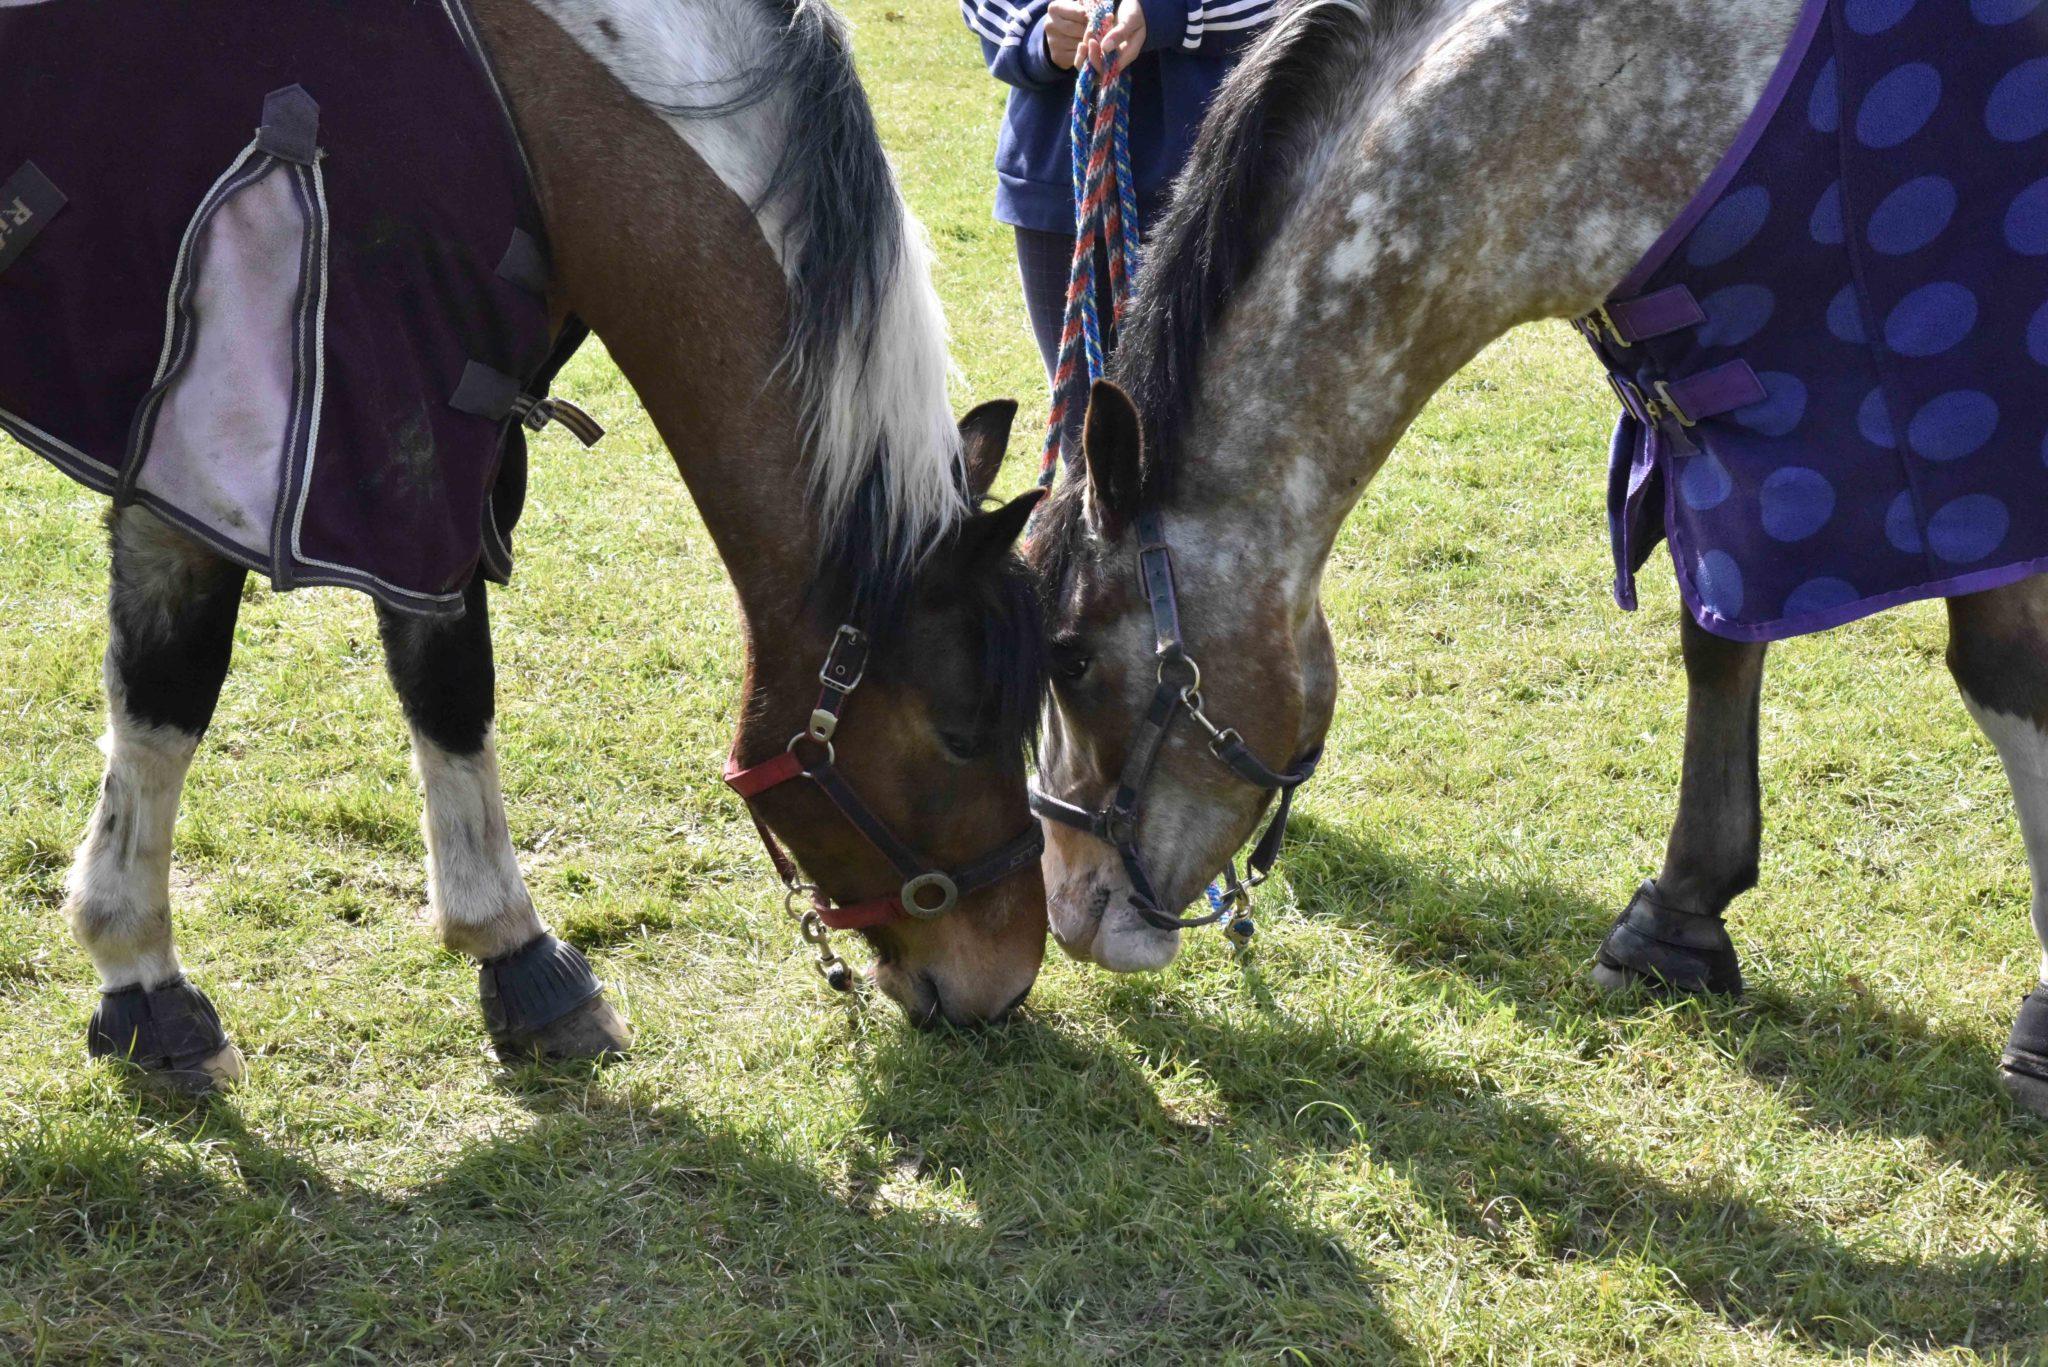 Greatham Equestrian Centre